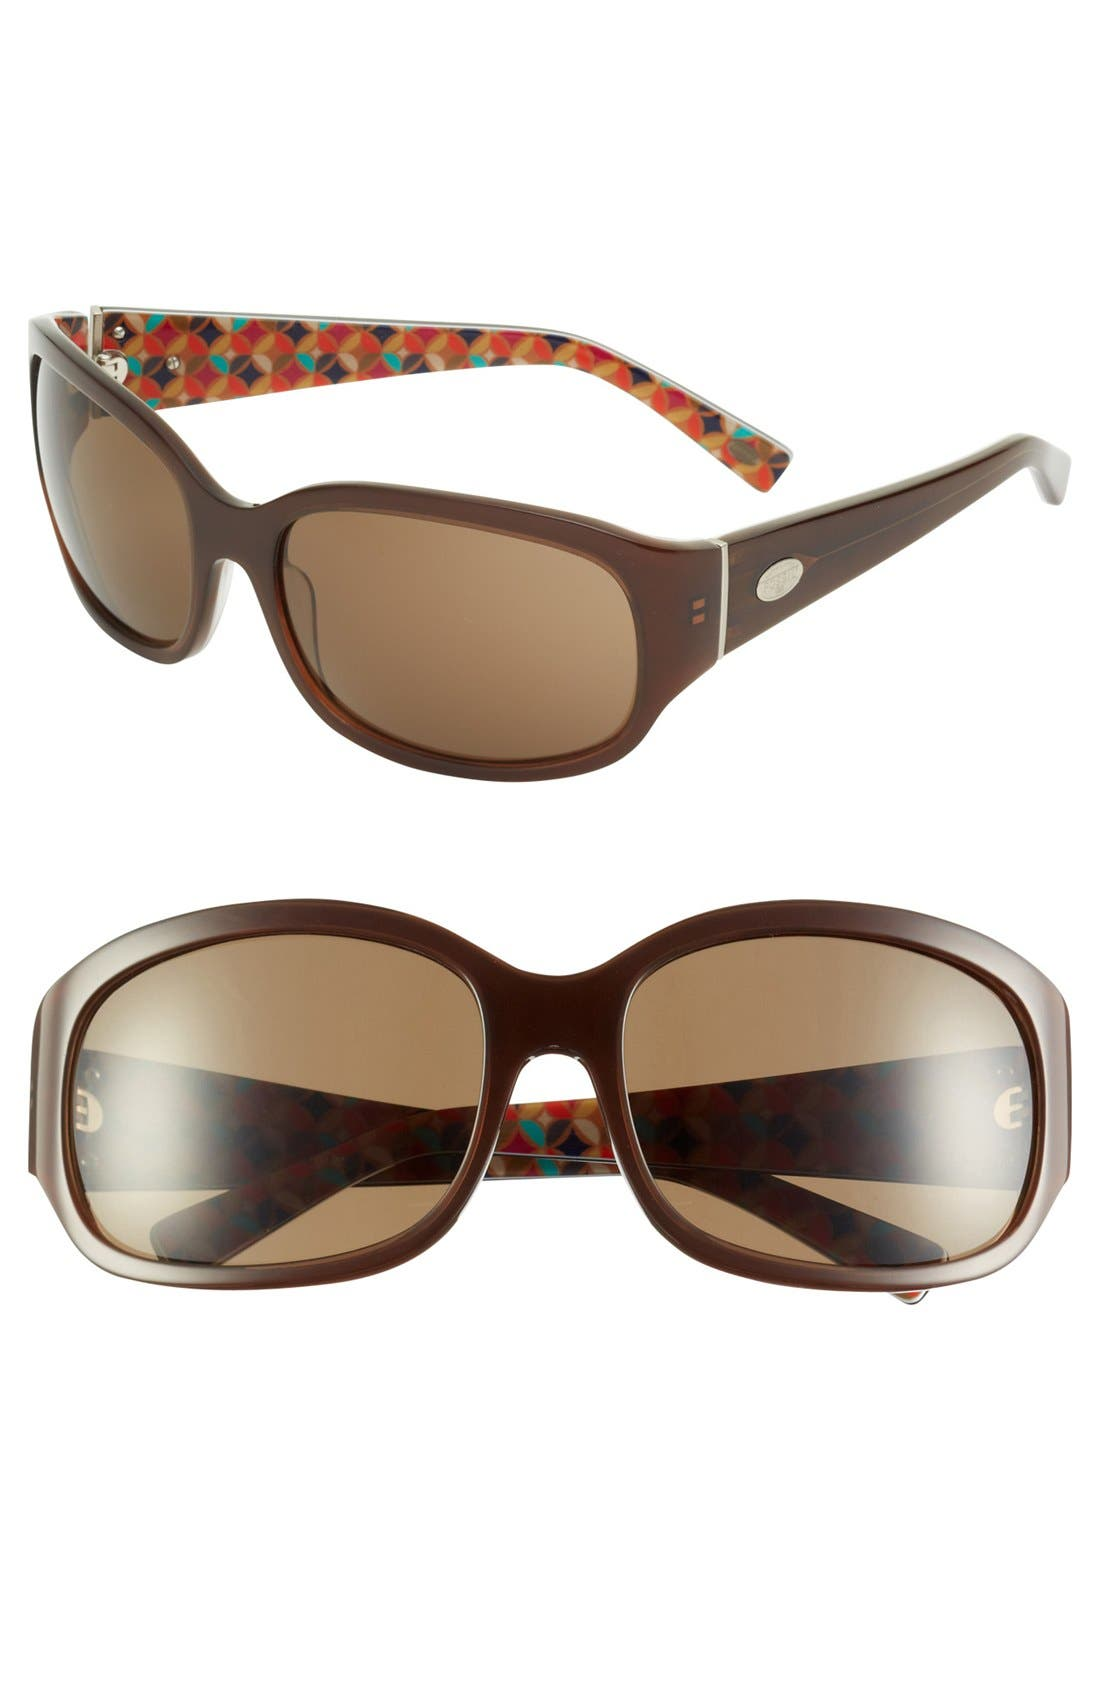 Main Image - Fossil 'Cece 3' 61mm Sunglasses